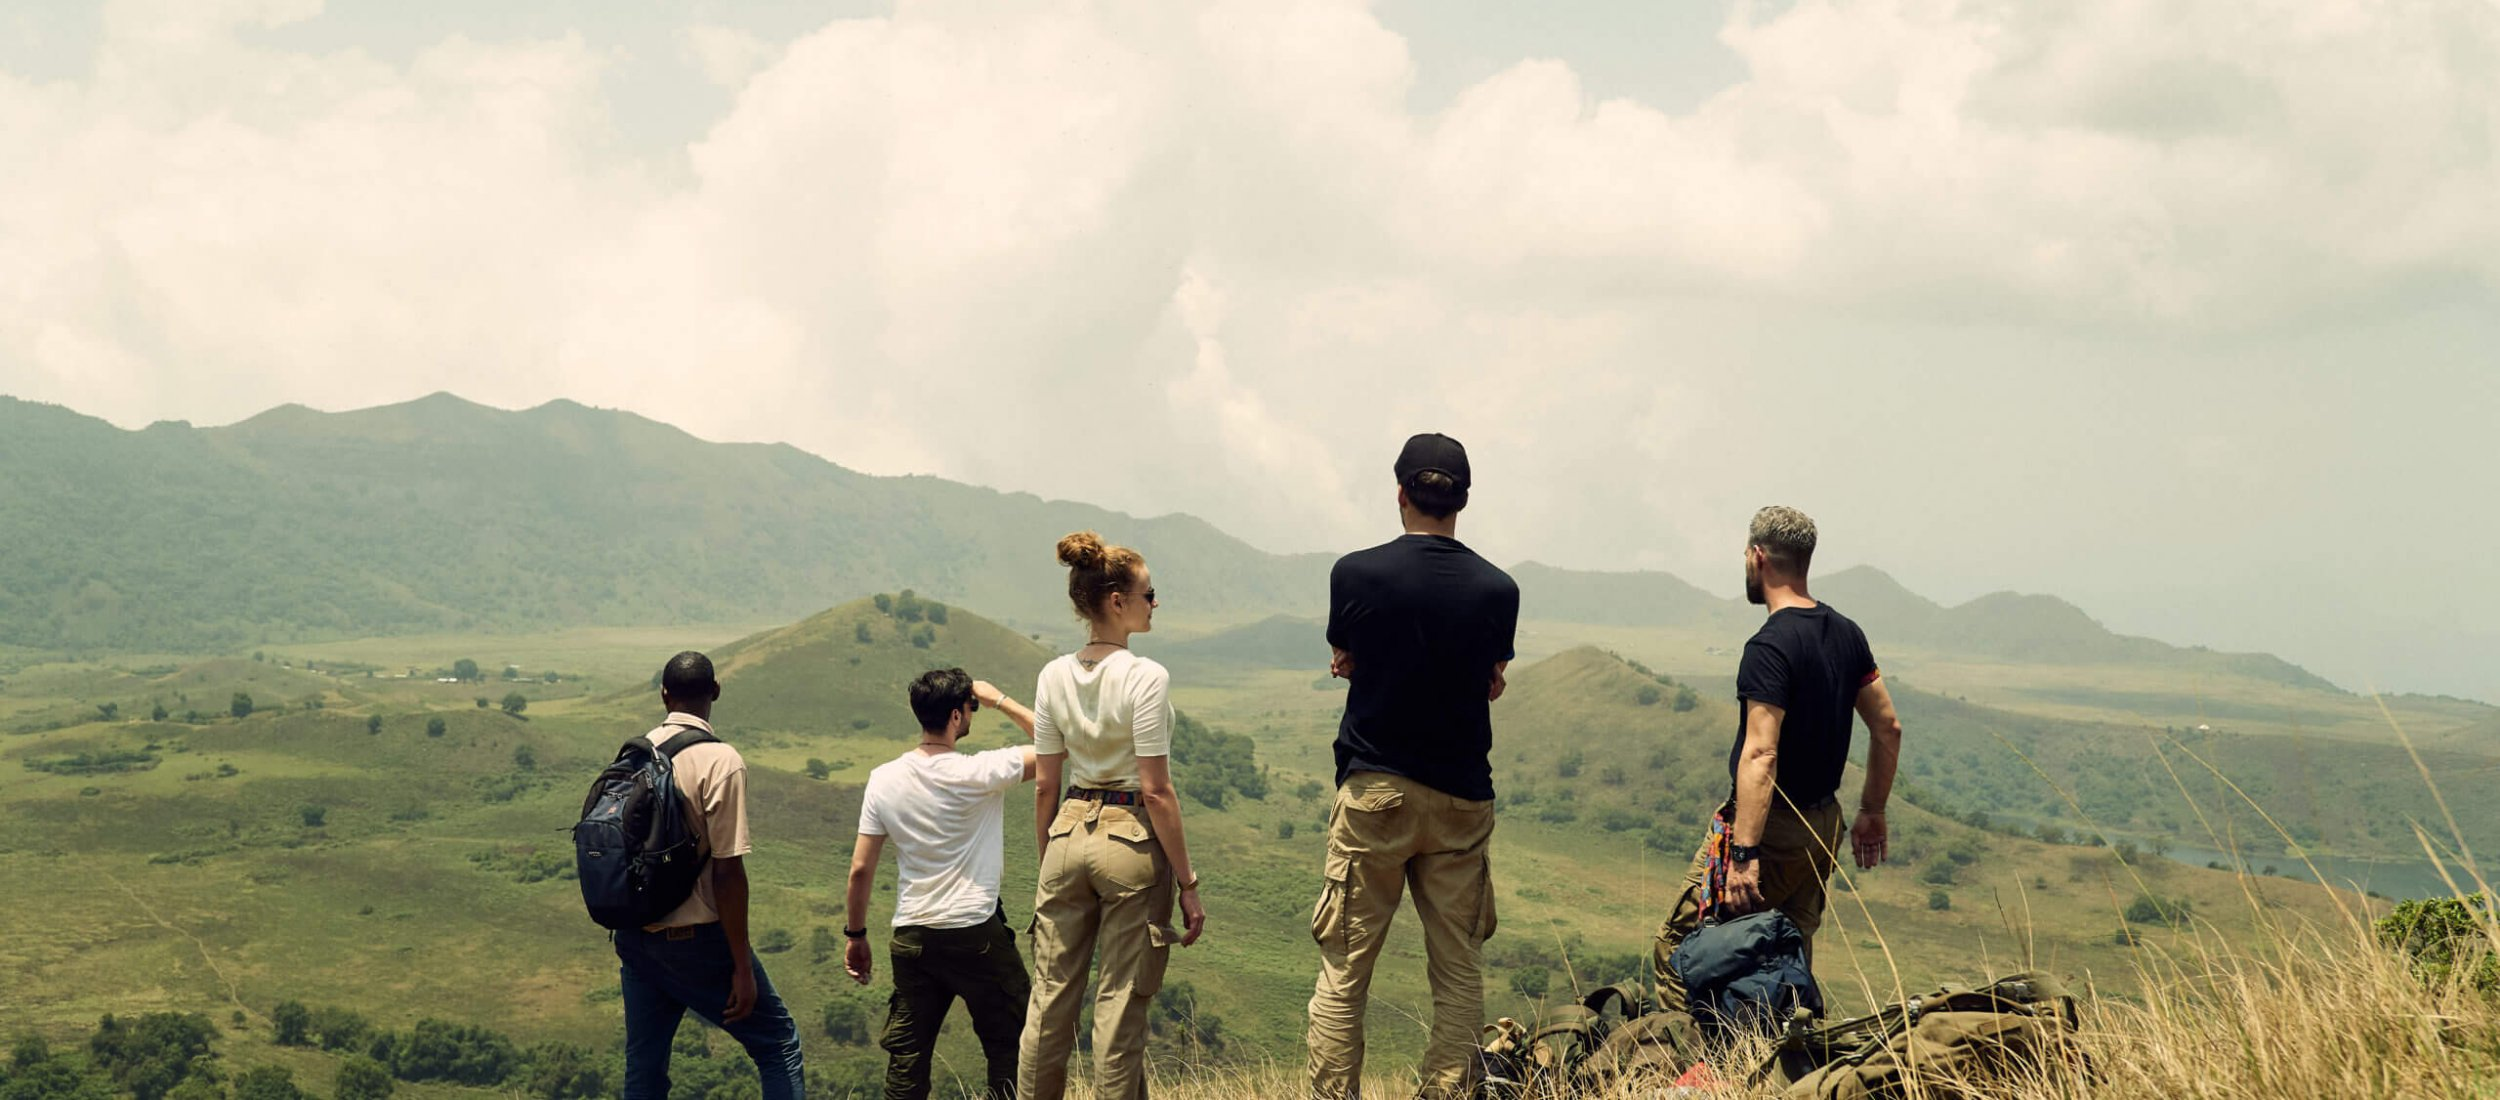 Das Vivi Kola Team auf einem Vulkan in Kamerun